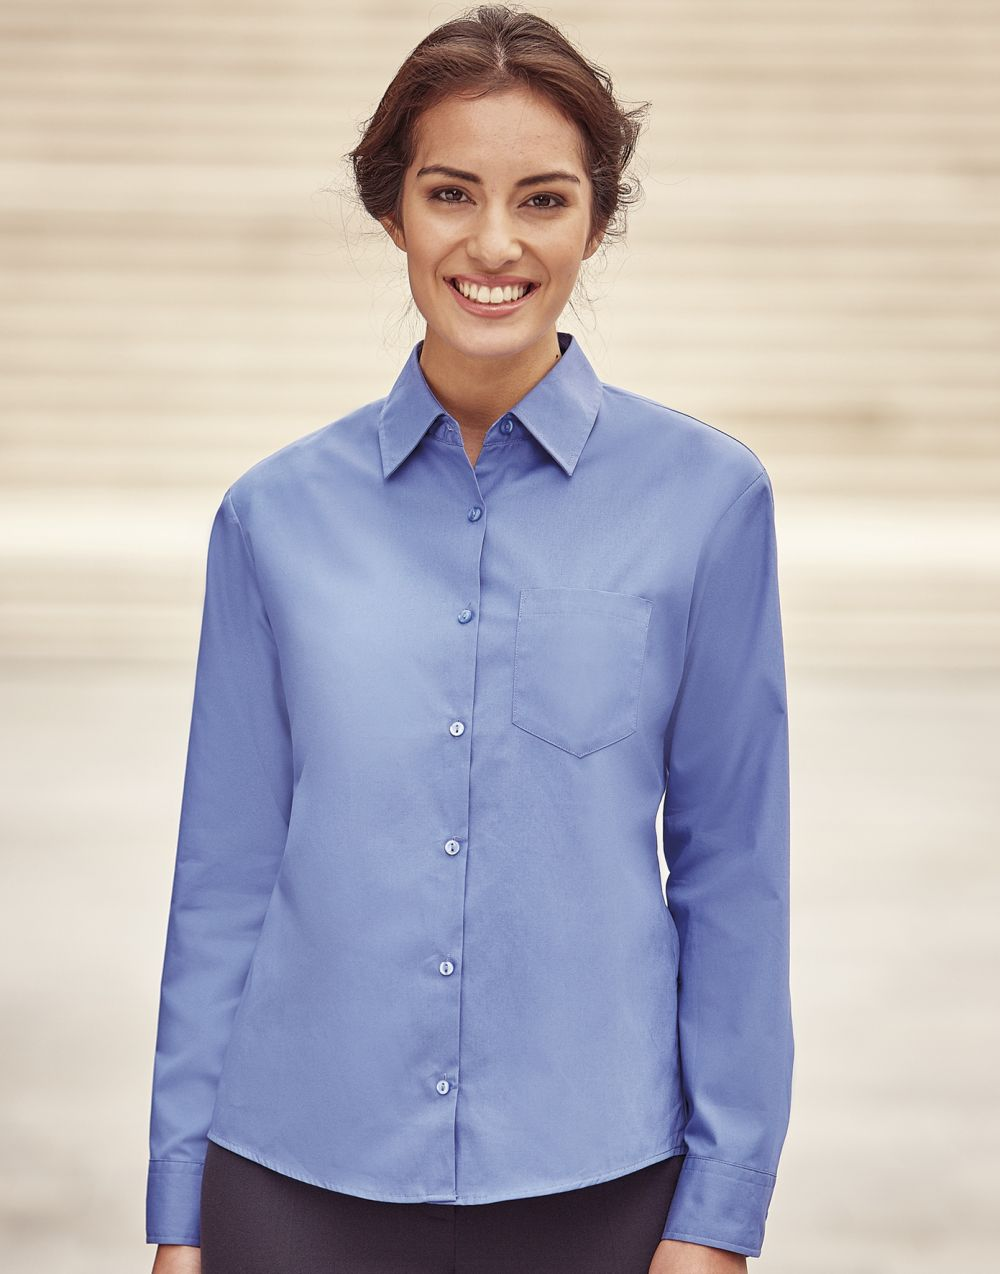 Camisas manga larga russell de mujer 100% algodón manga larga imagen 1